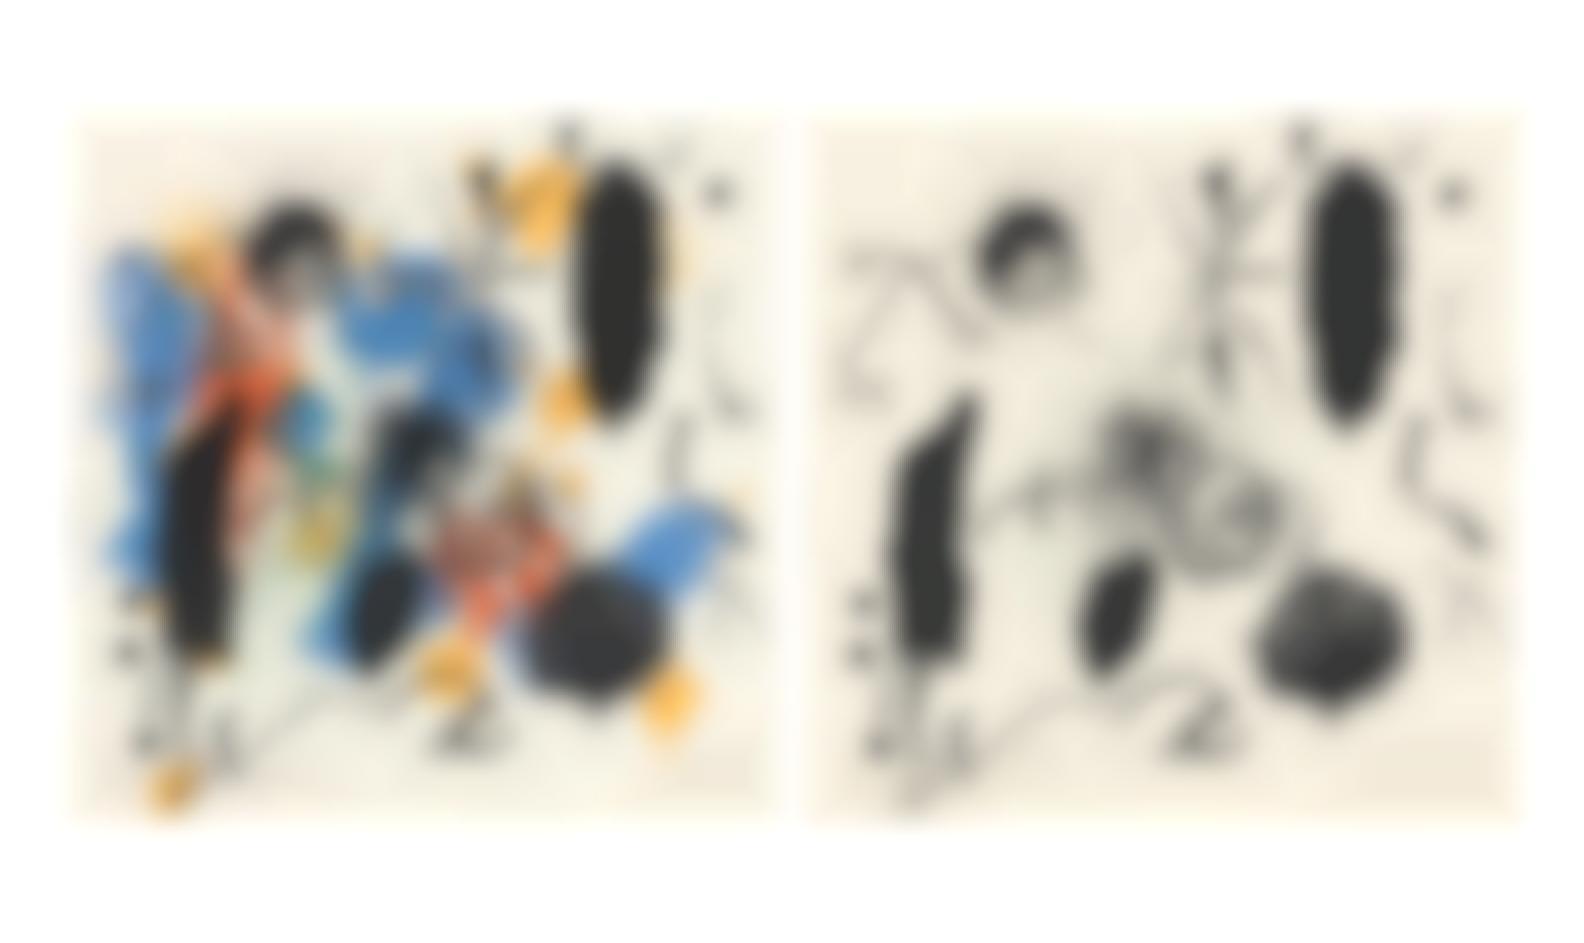 Joan Miro-Two Plates, From Je Travaille Comme Un Jardinier (Mourlot 413, 417; Cramer Books 90)-1964